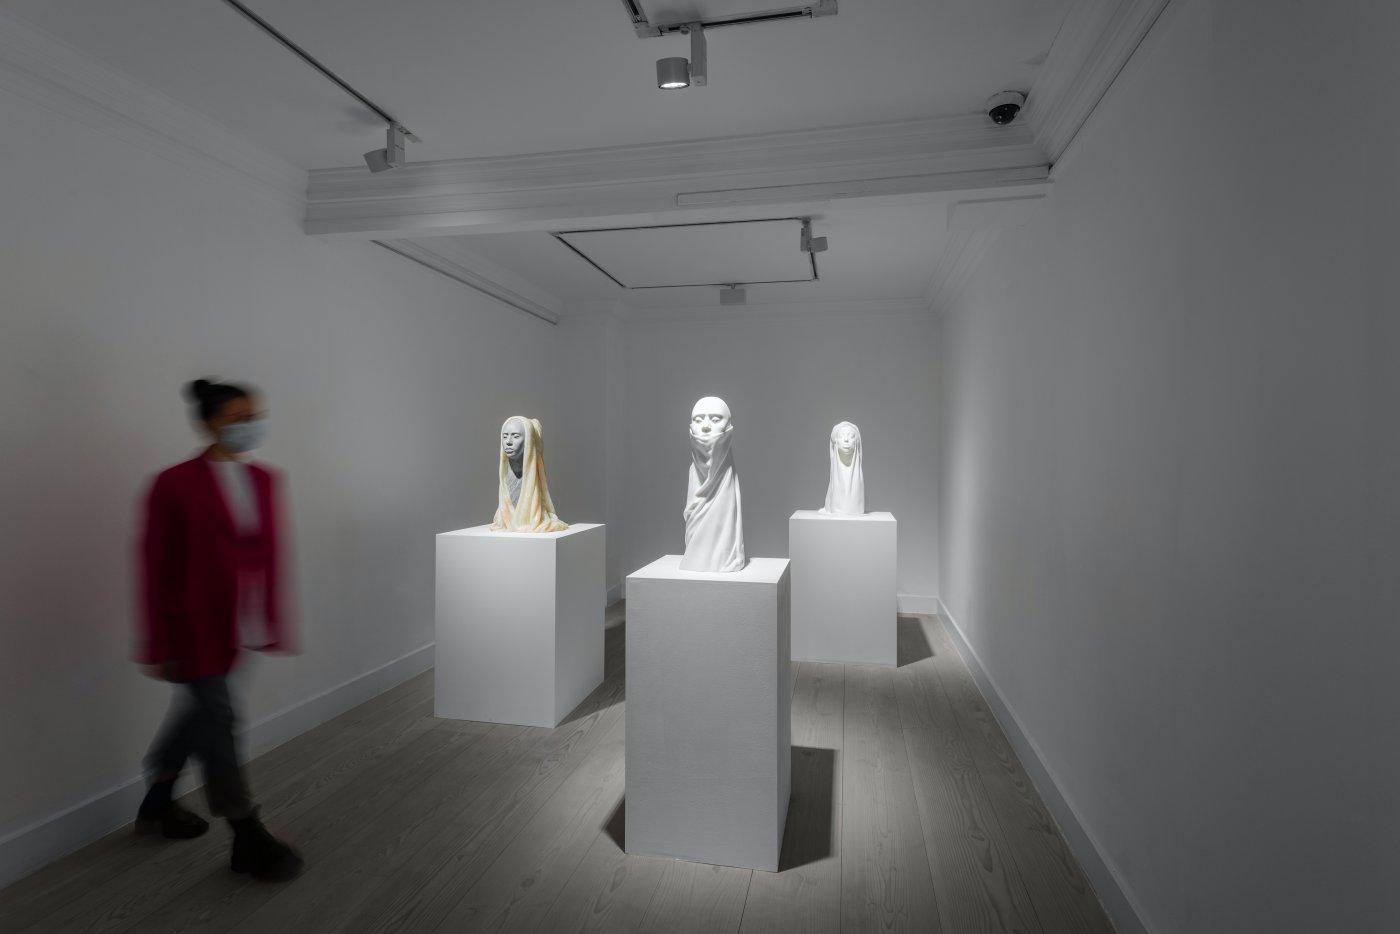 Gazelli Art House Aidan Salakhova 4